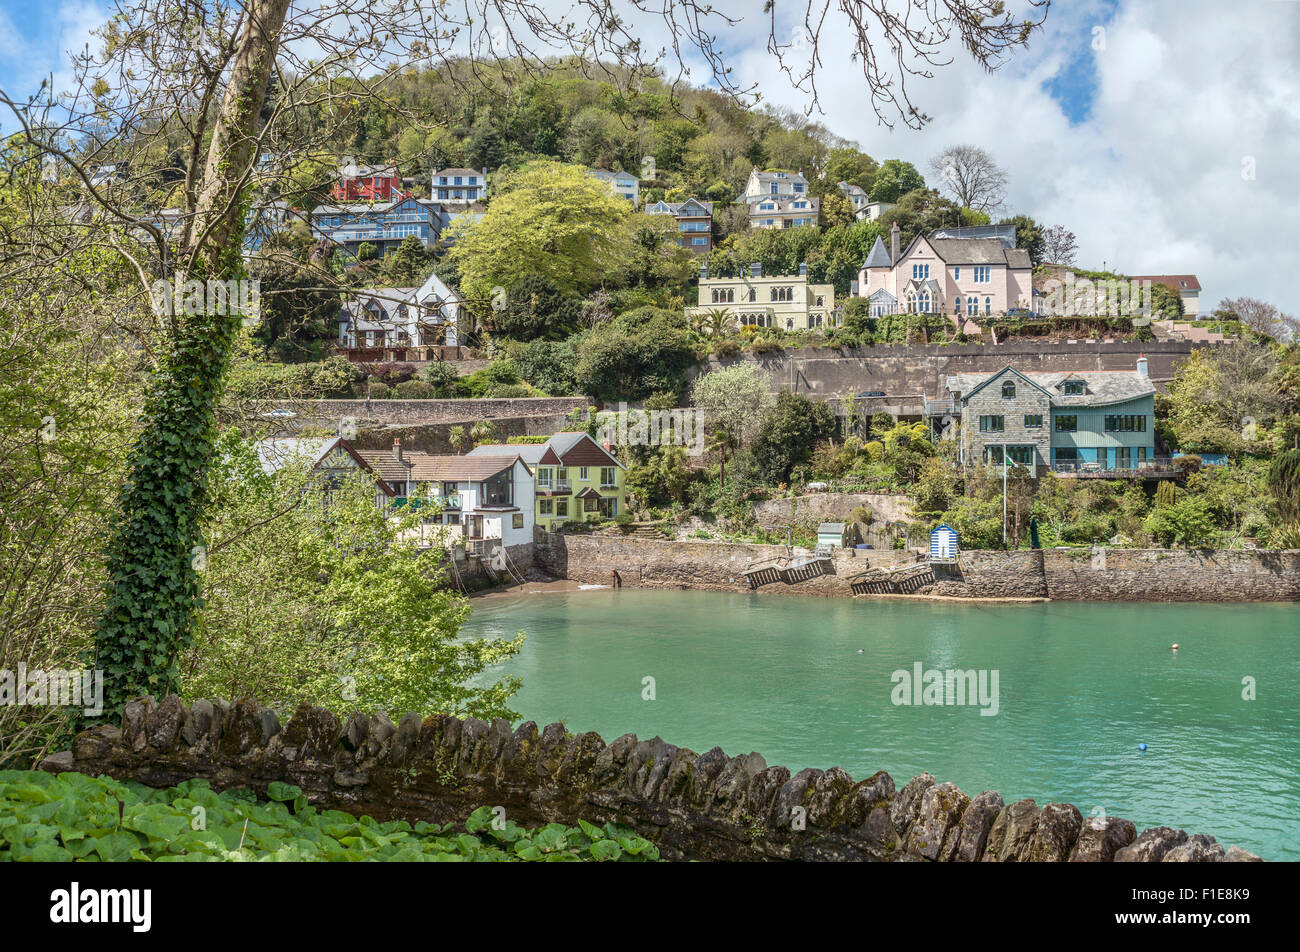 Ver en Warfleet Creek en Dartmouth en el río Dart, Devon, Inglaterra, Reino Unido | Aussicht auf den Warfleet Imagen De Stock